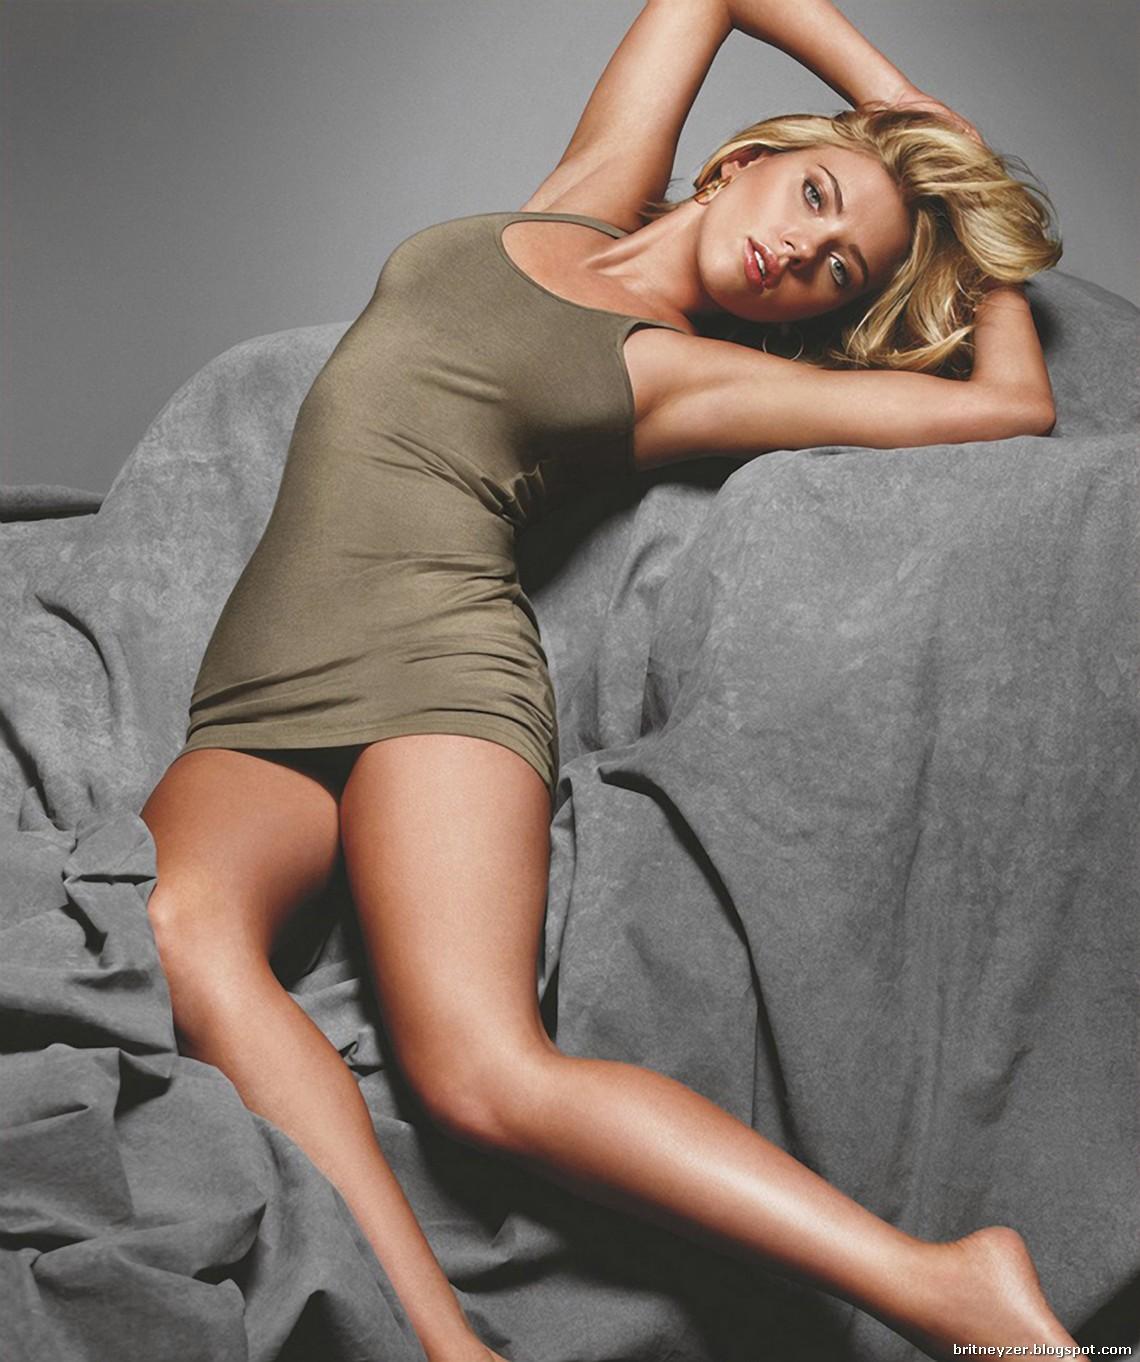 http://3.bp.blogspot.com/_IgZ5UAsch_s/TOJzn4Fj46I/AAAAAAAACC4/y8Oh3fSgGM0/s1600/Scarlett-Johansson-babe-year-gq-photoshoot-03.jpg